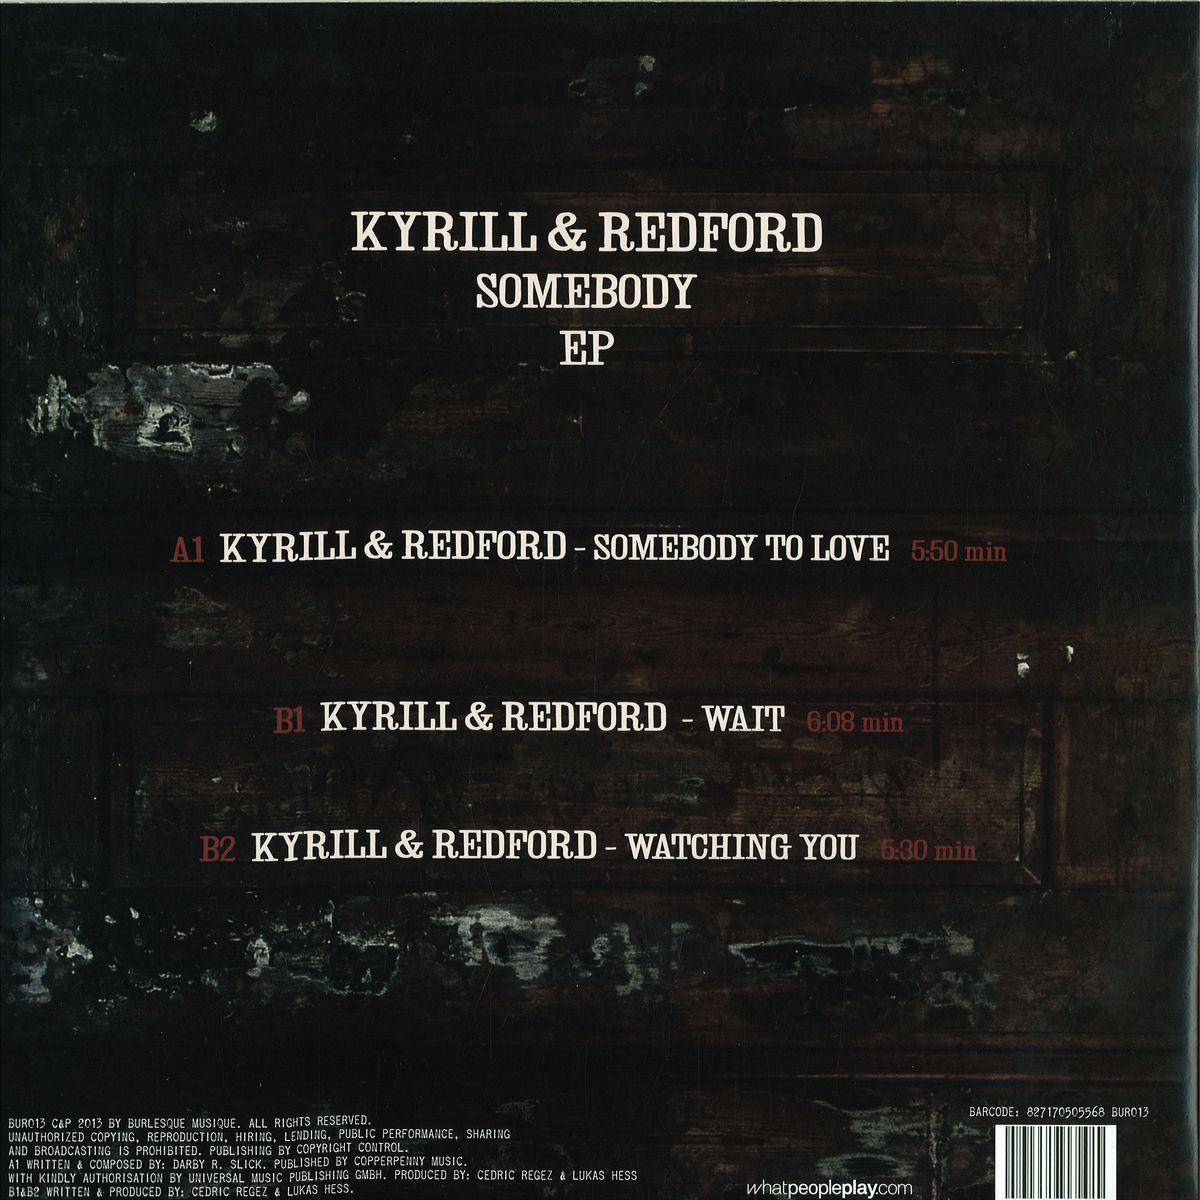 Kyrill & Redford - Somebody Ep / BURLESQUE BUR013 - Vinyl